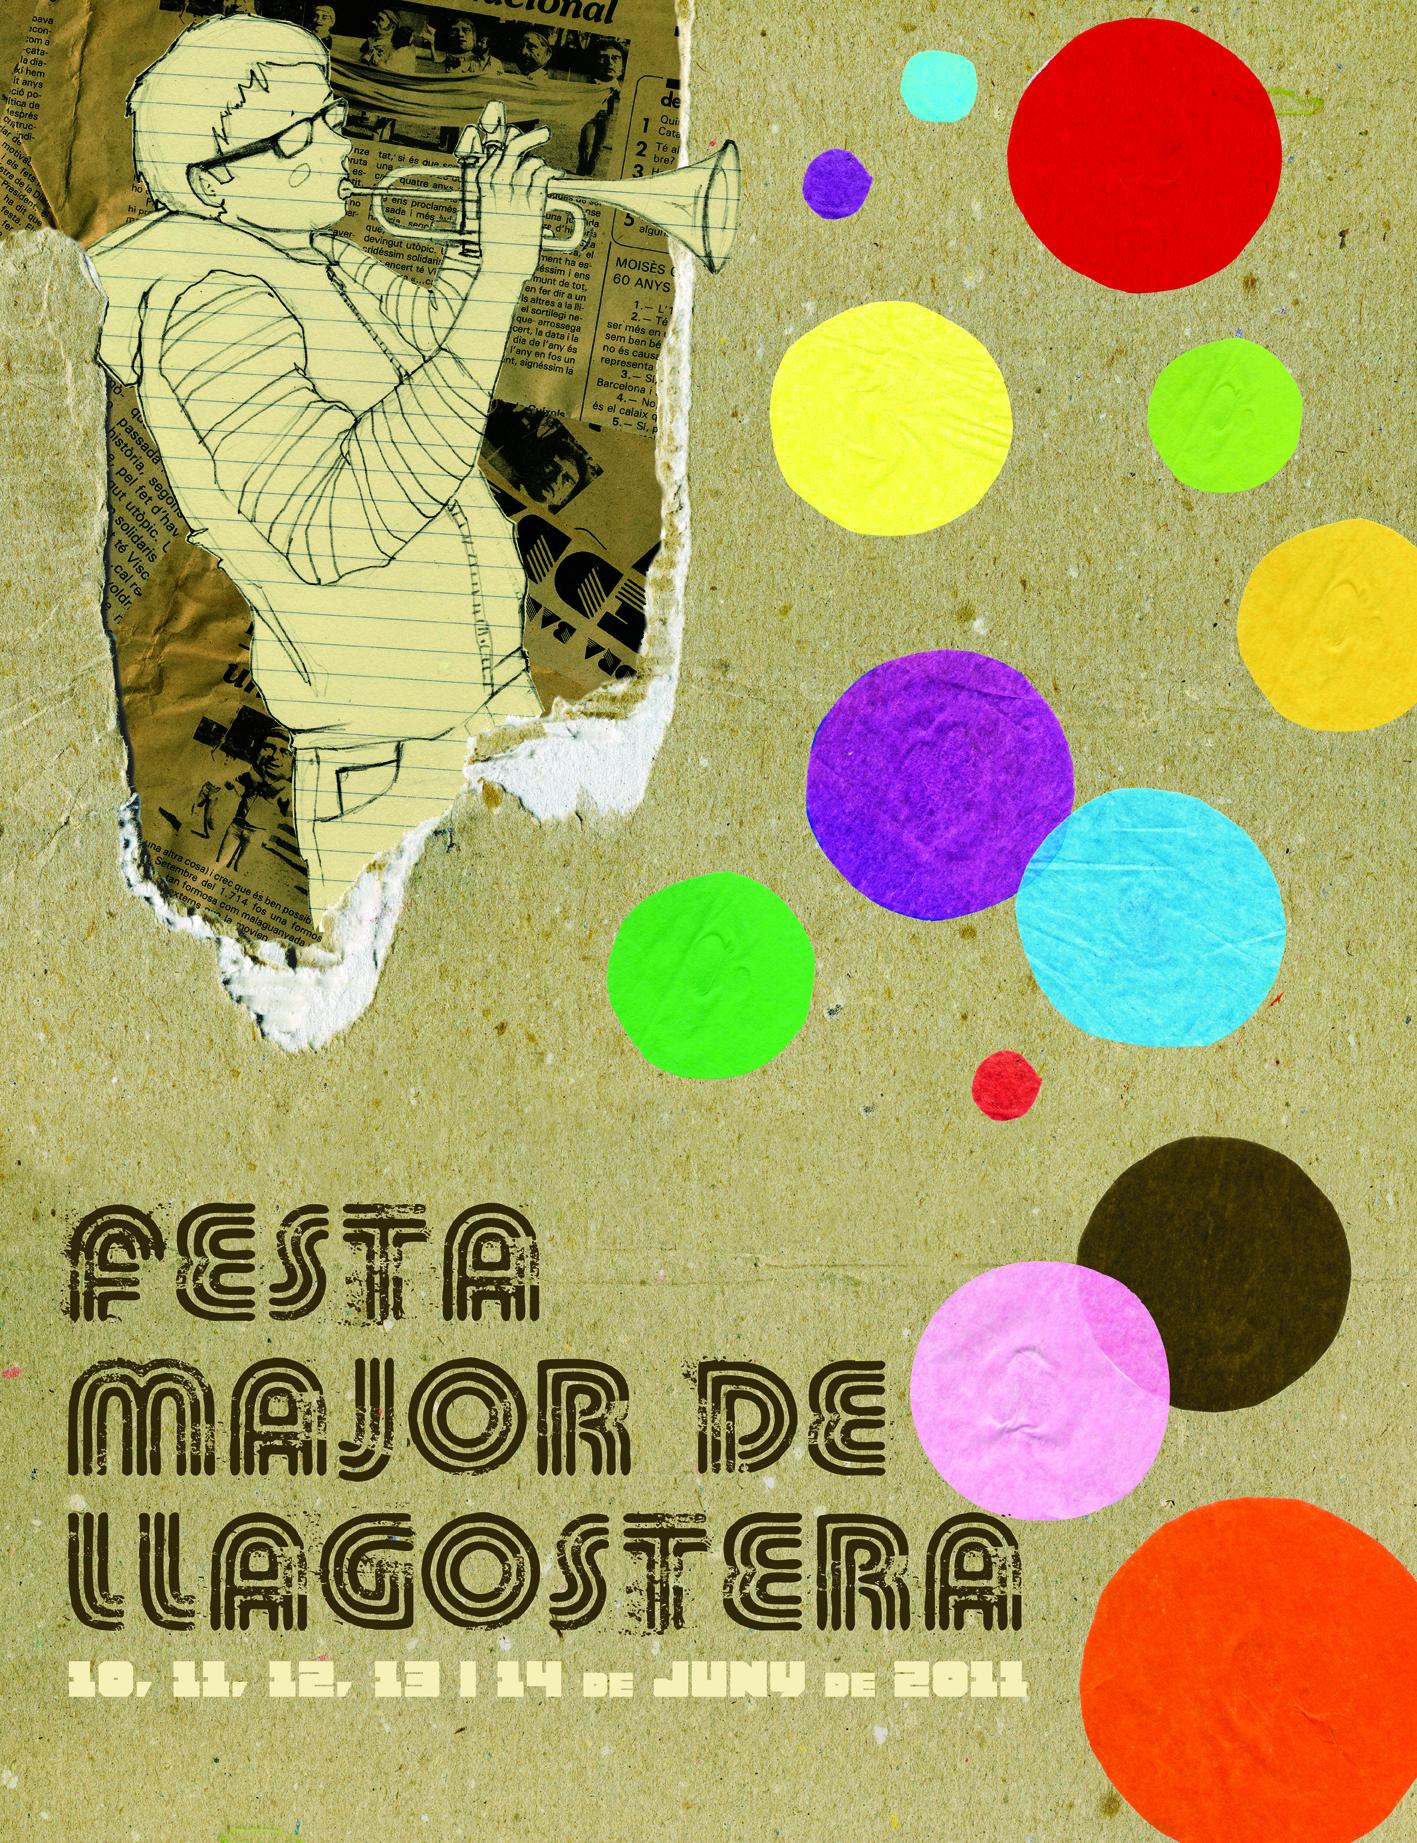 Llagostera Festival Poster 2011